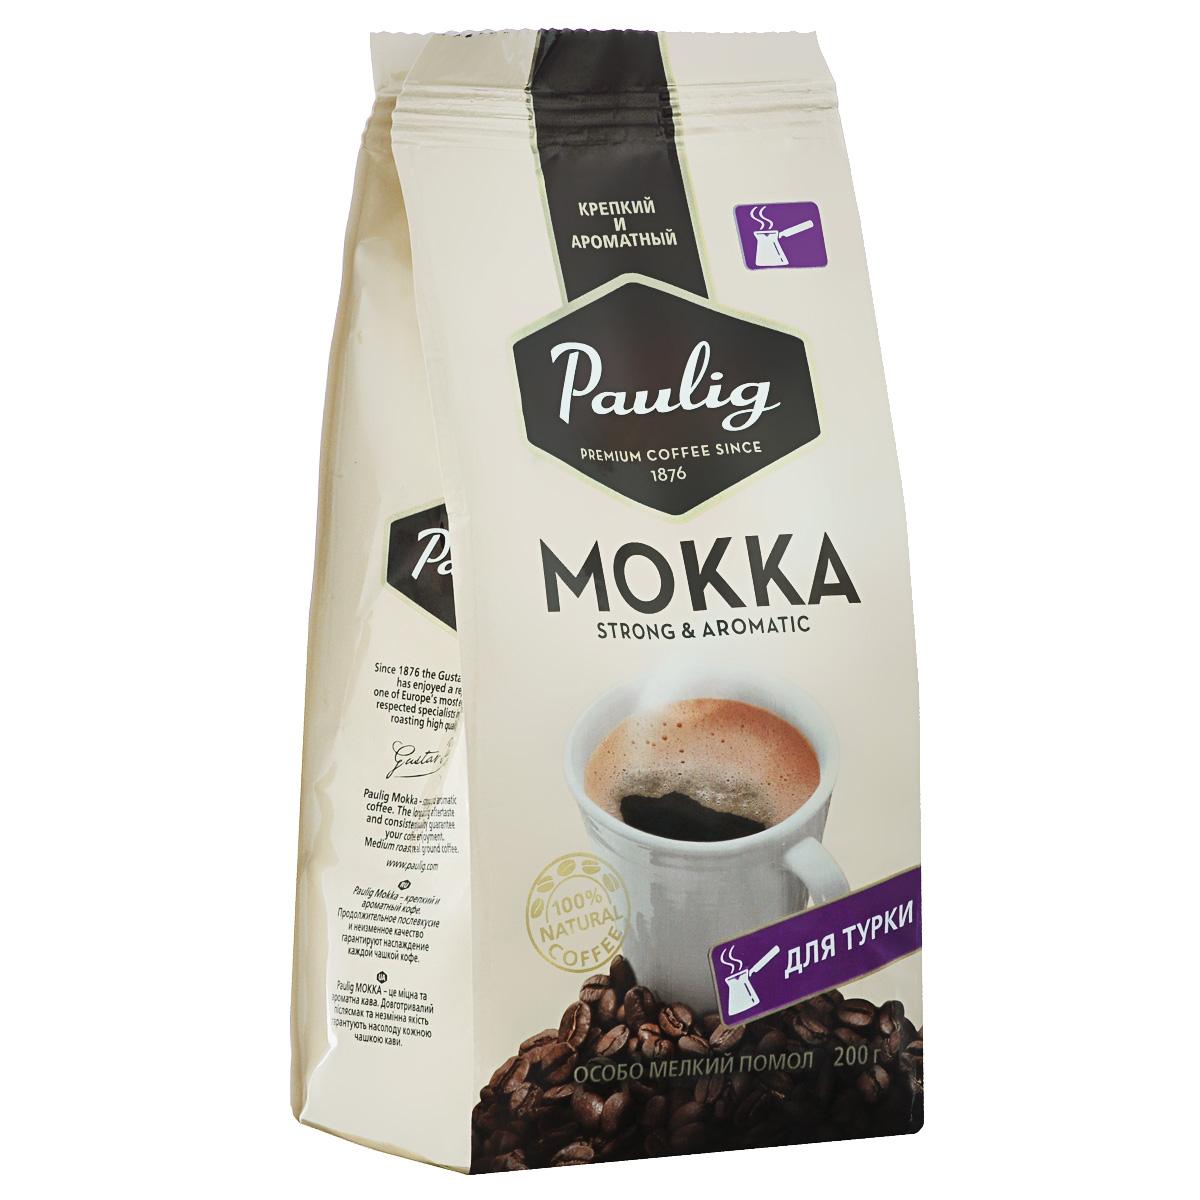 Paulig Mokka кофе молотый для турки, 200 г